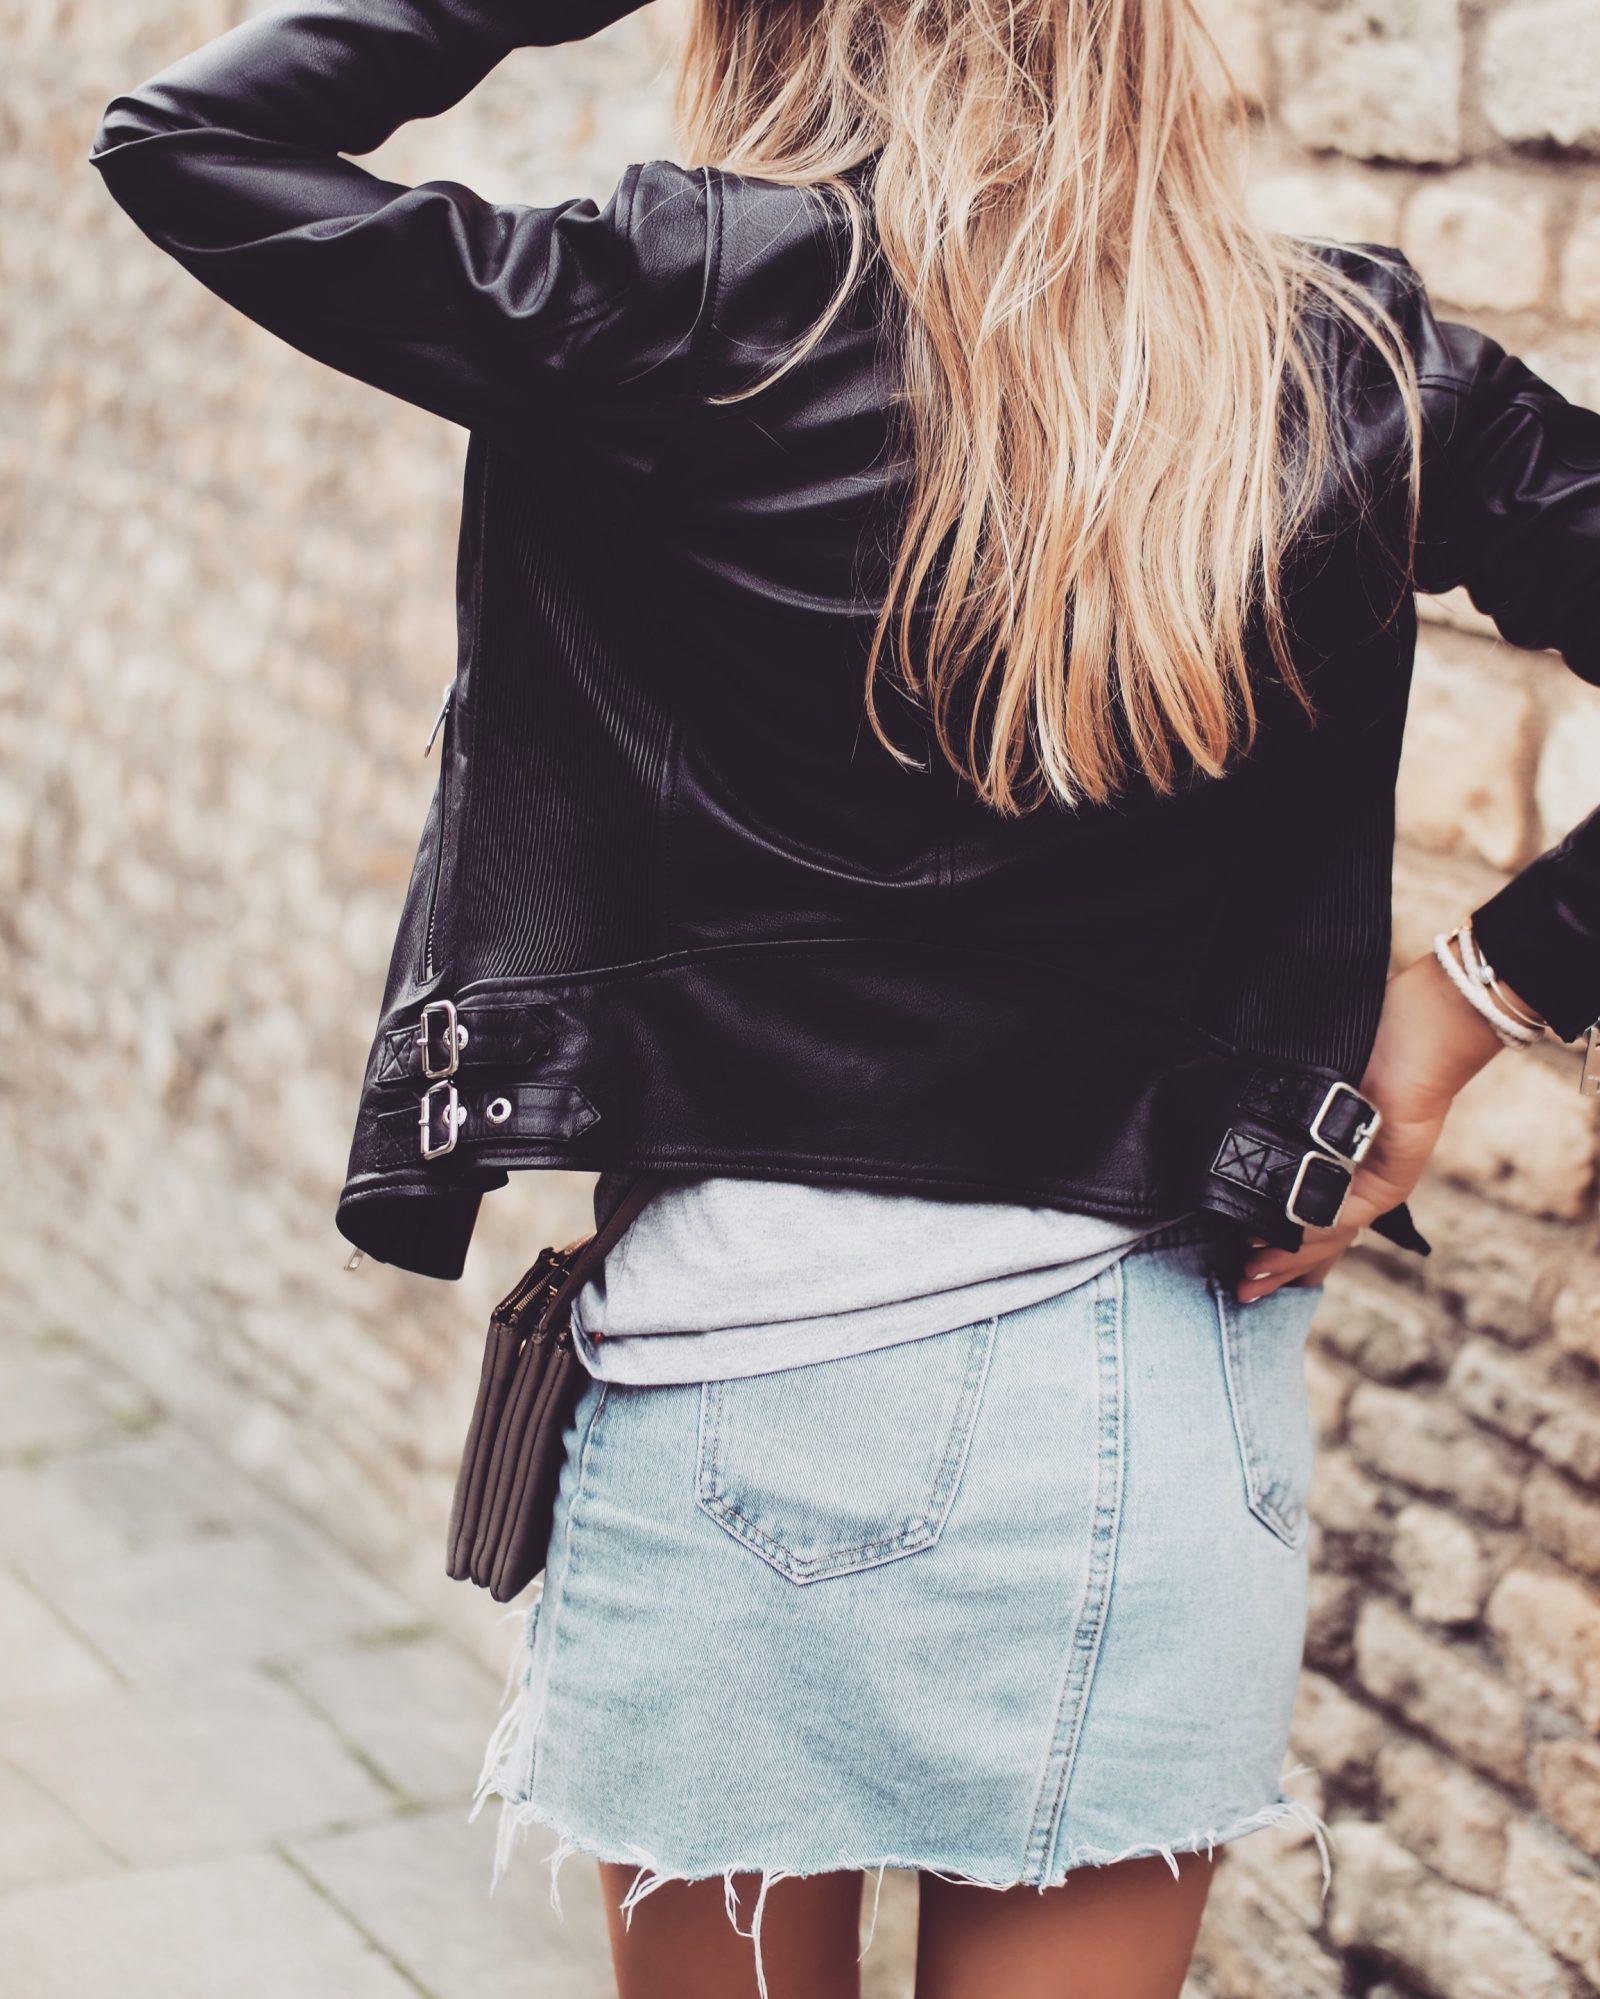 Leather Jacket - Deisel Classic Style